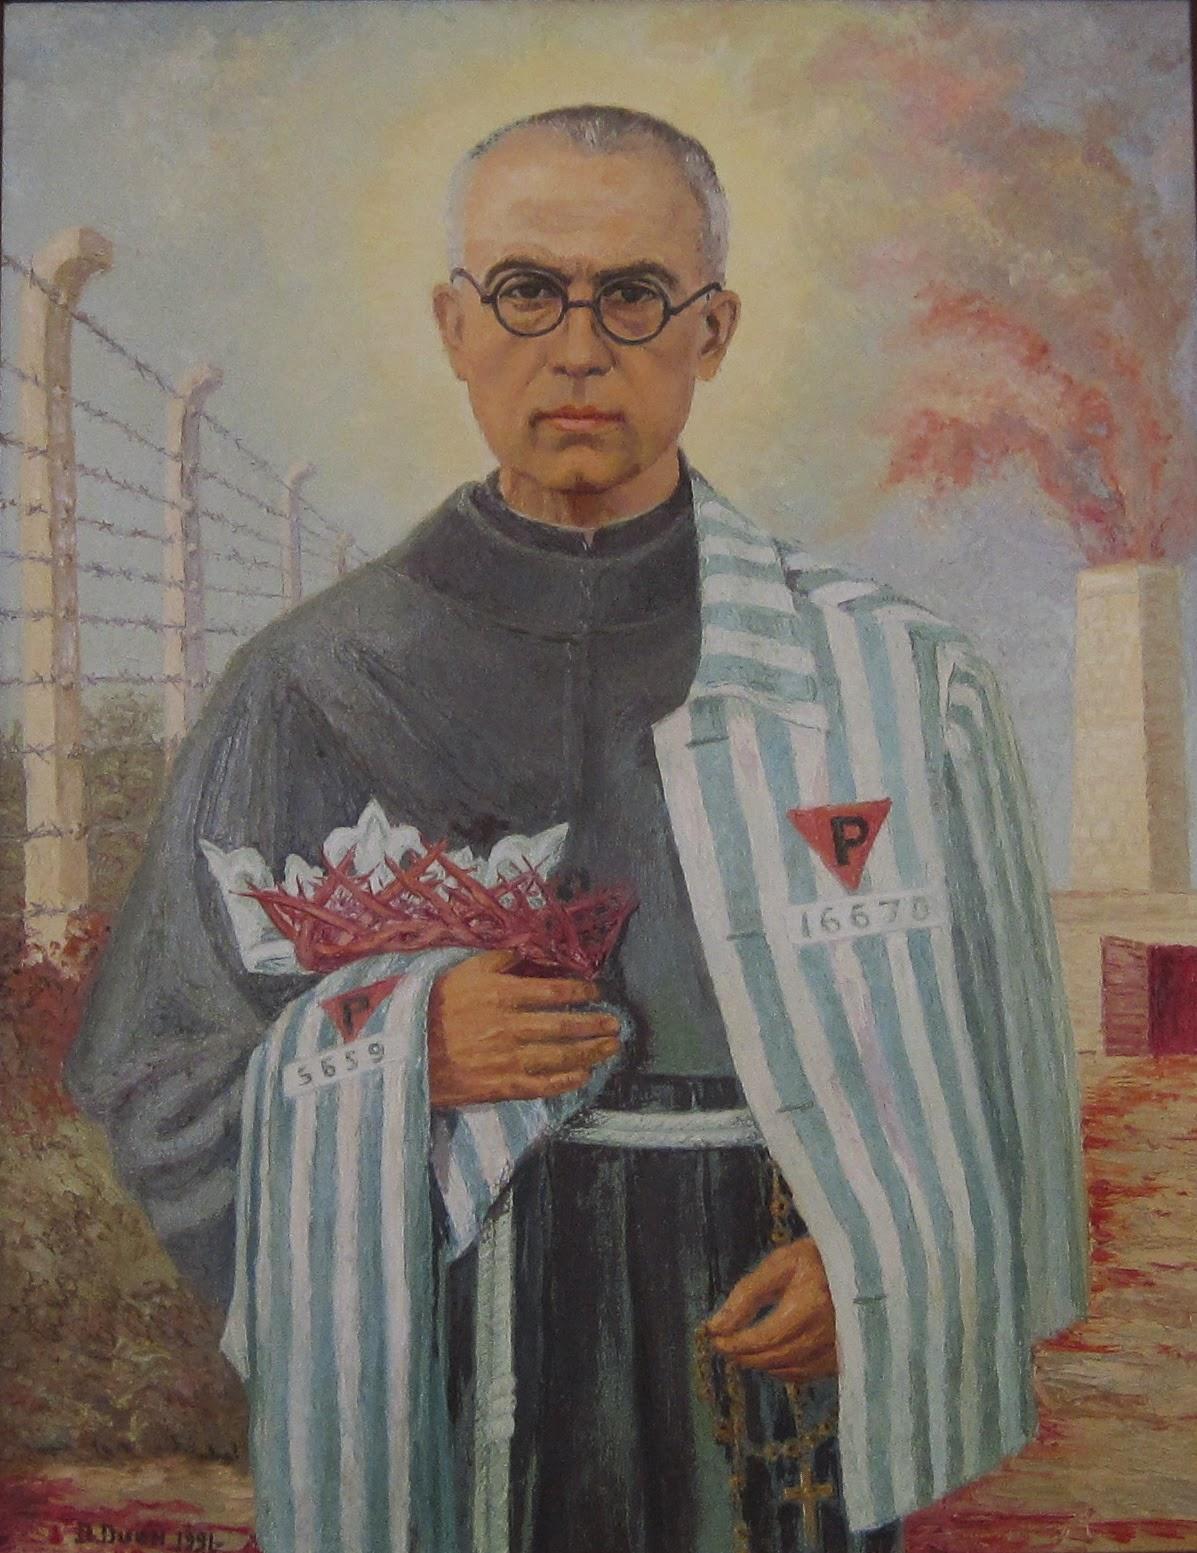 San Massimiliano Kolbe dans immagini sacre img_3256